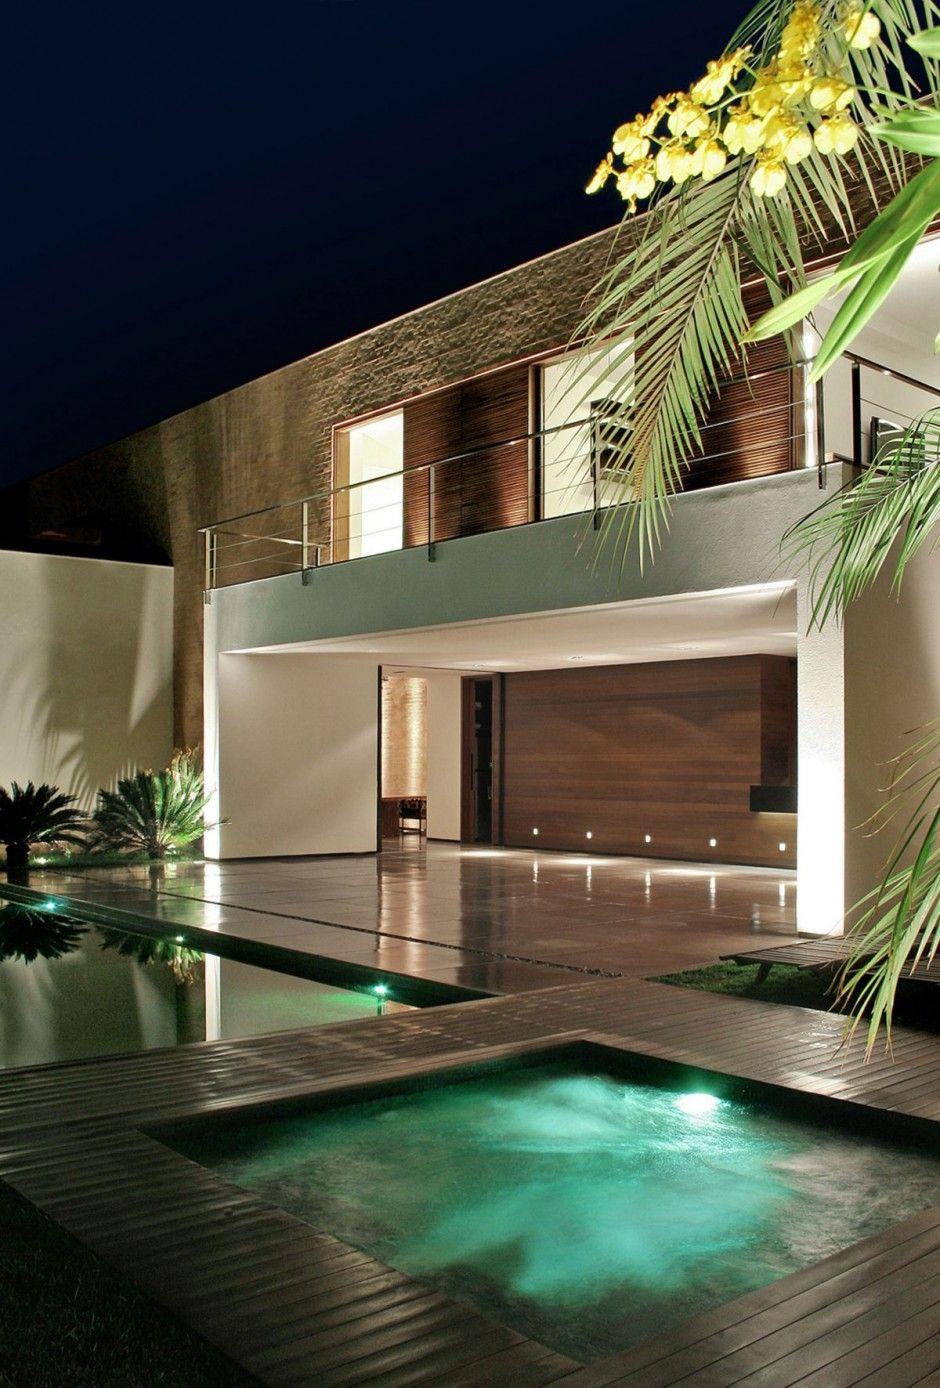 Brazil house jacuzzi fachada de casas pinterest for Jacuzzi casa moderna